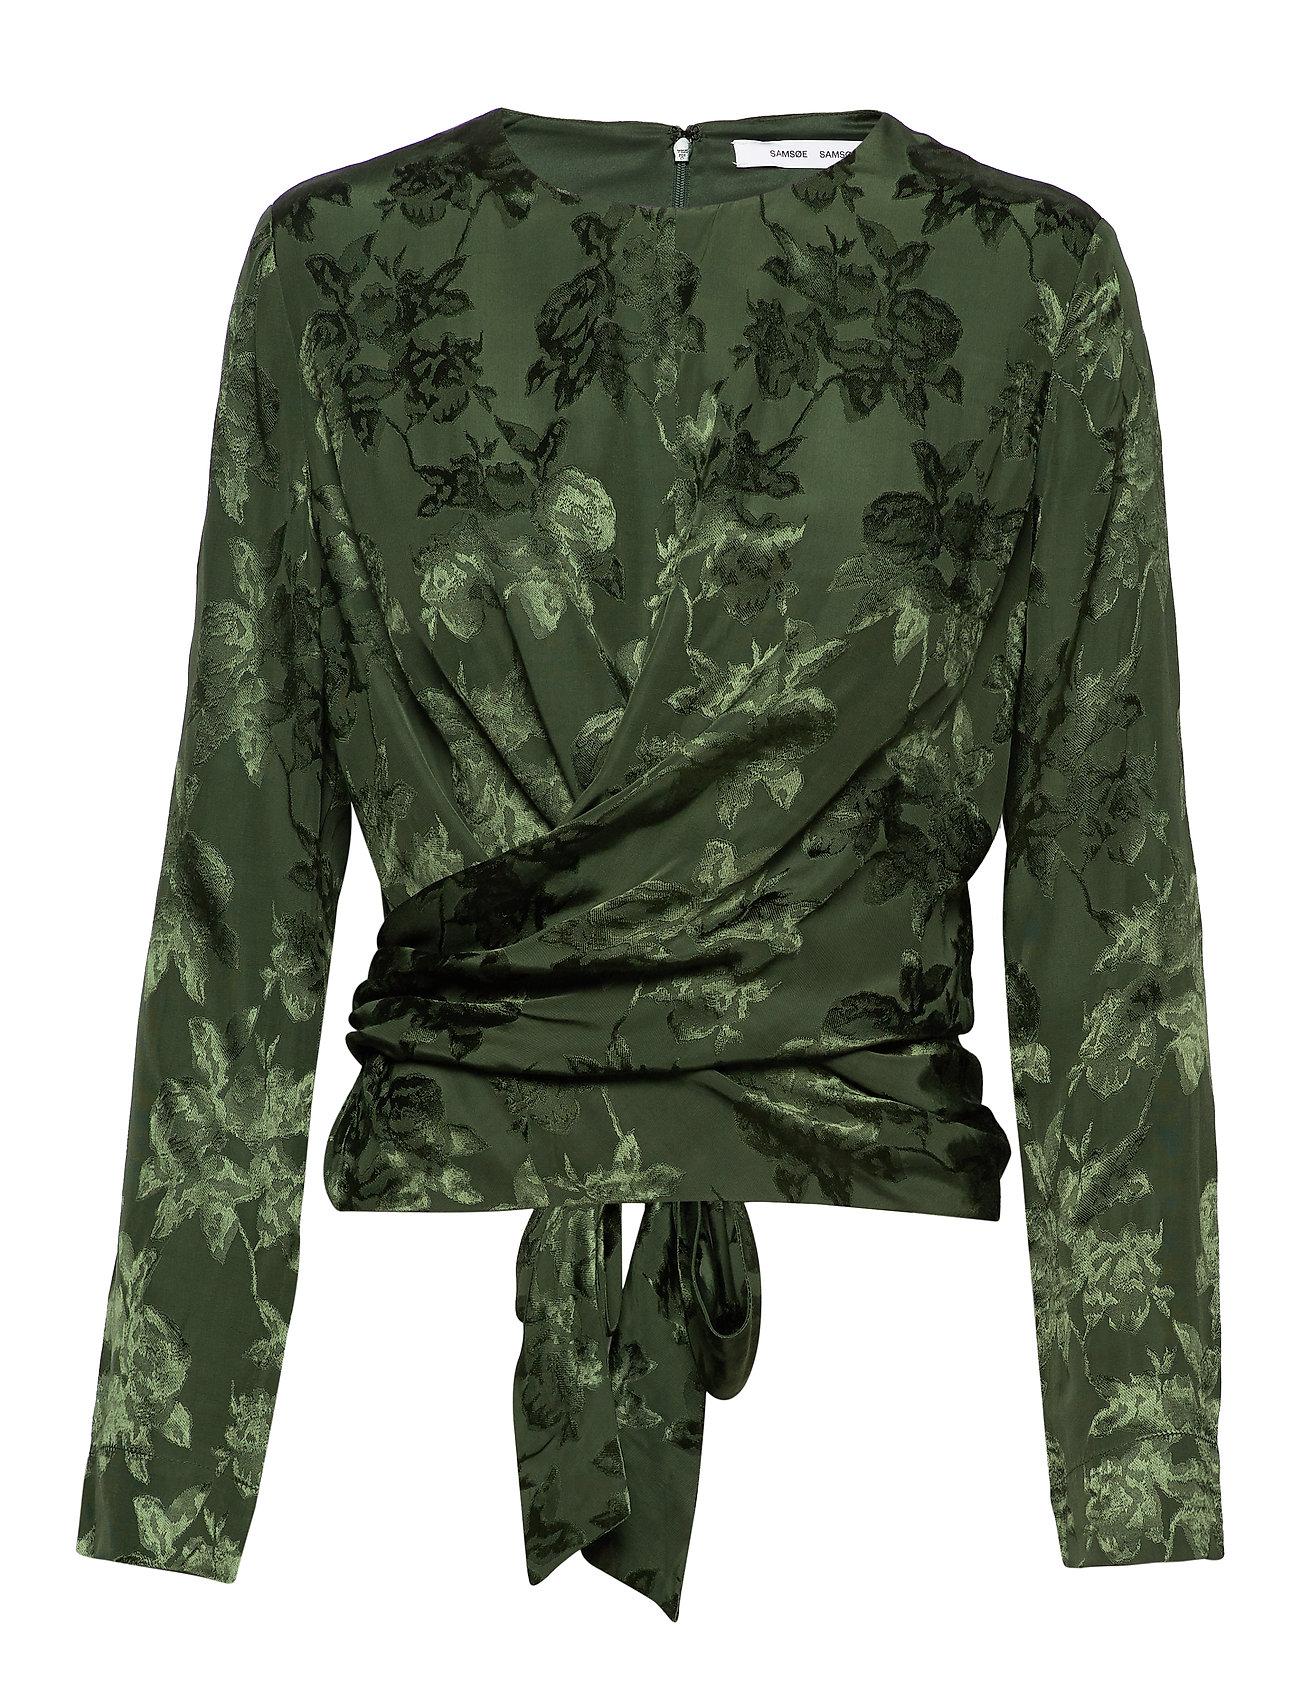 Samsøe & Samsøe Ono blouse 11333 - DEEP FOREST